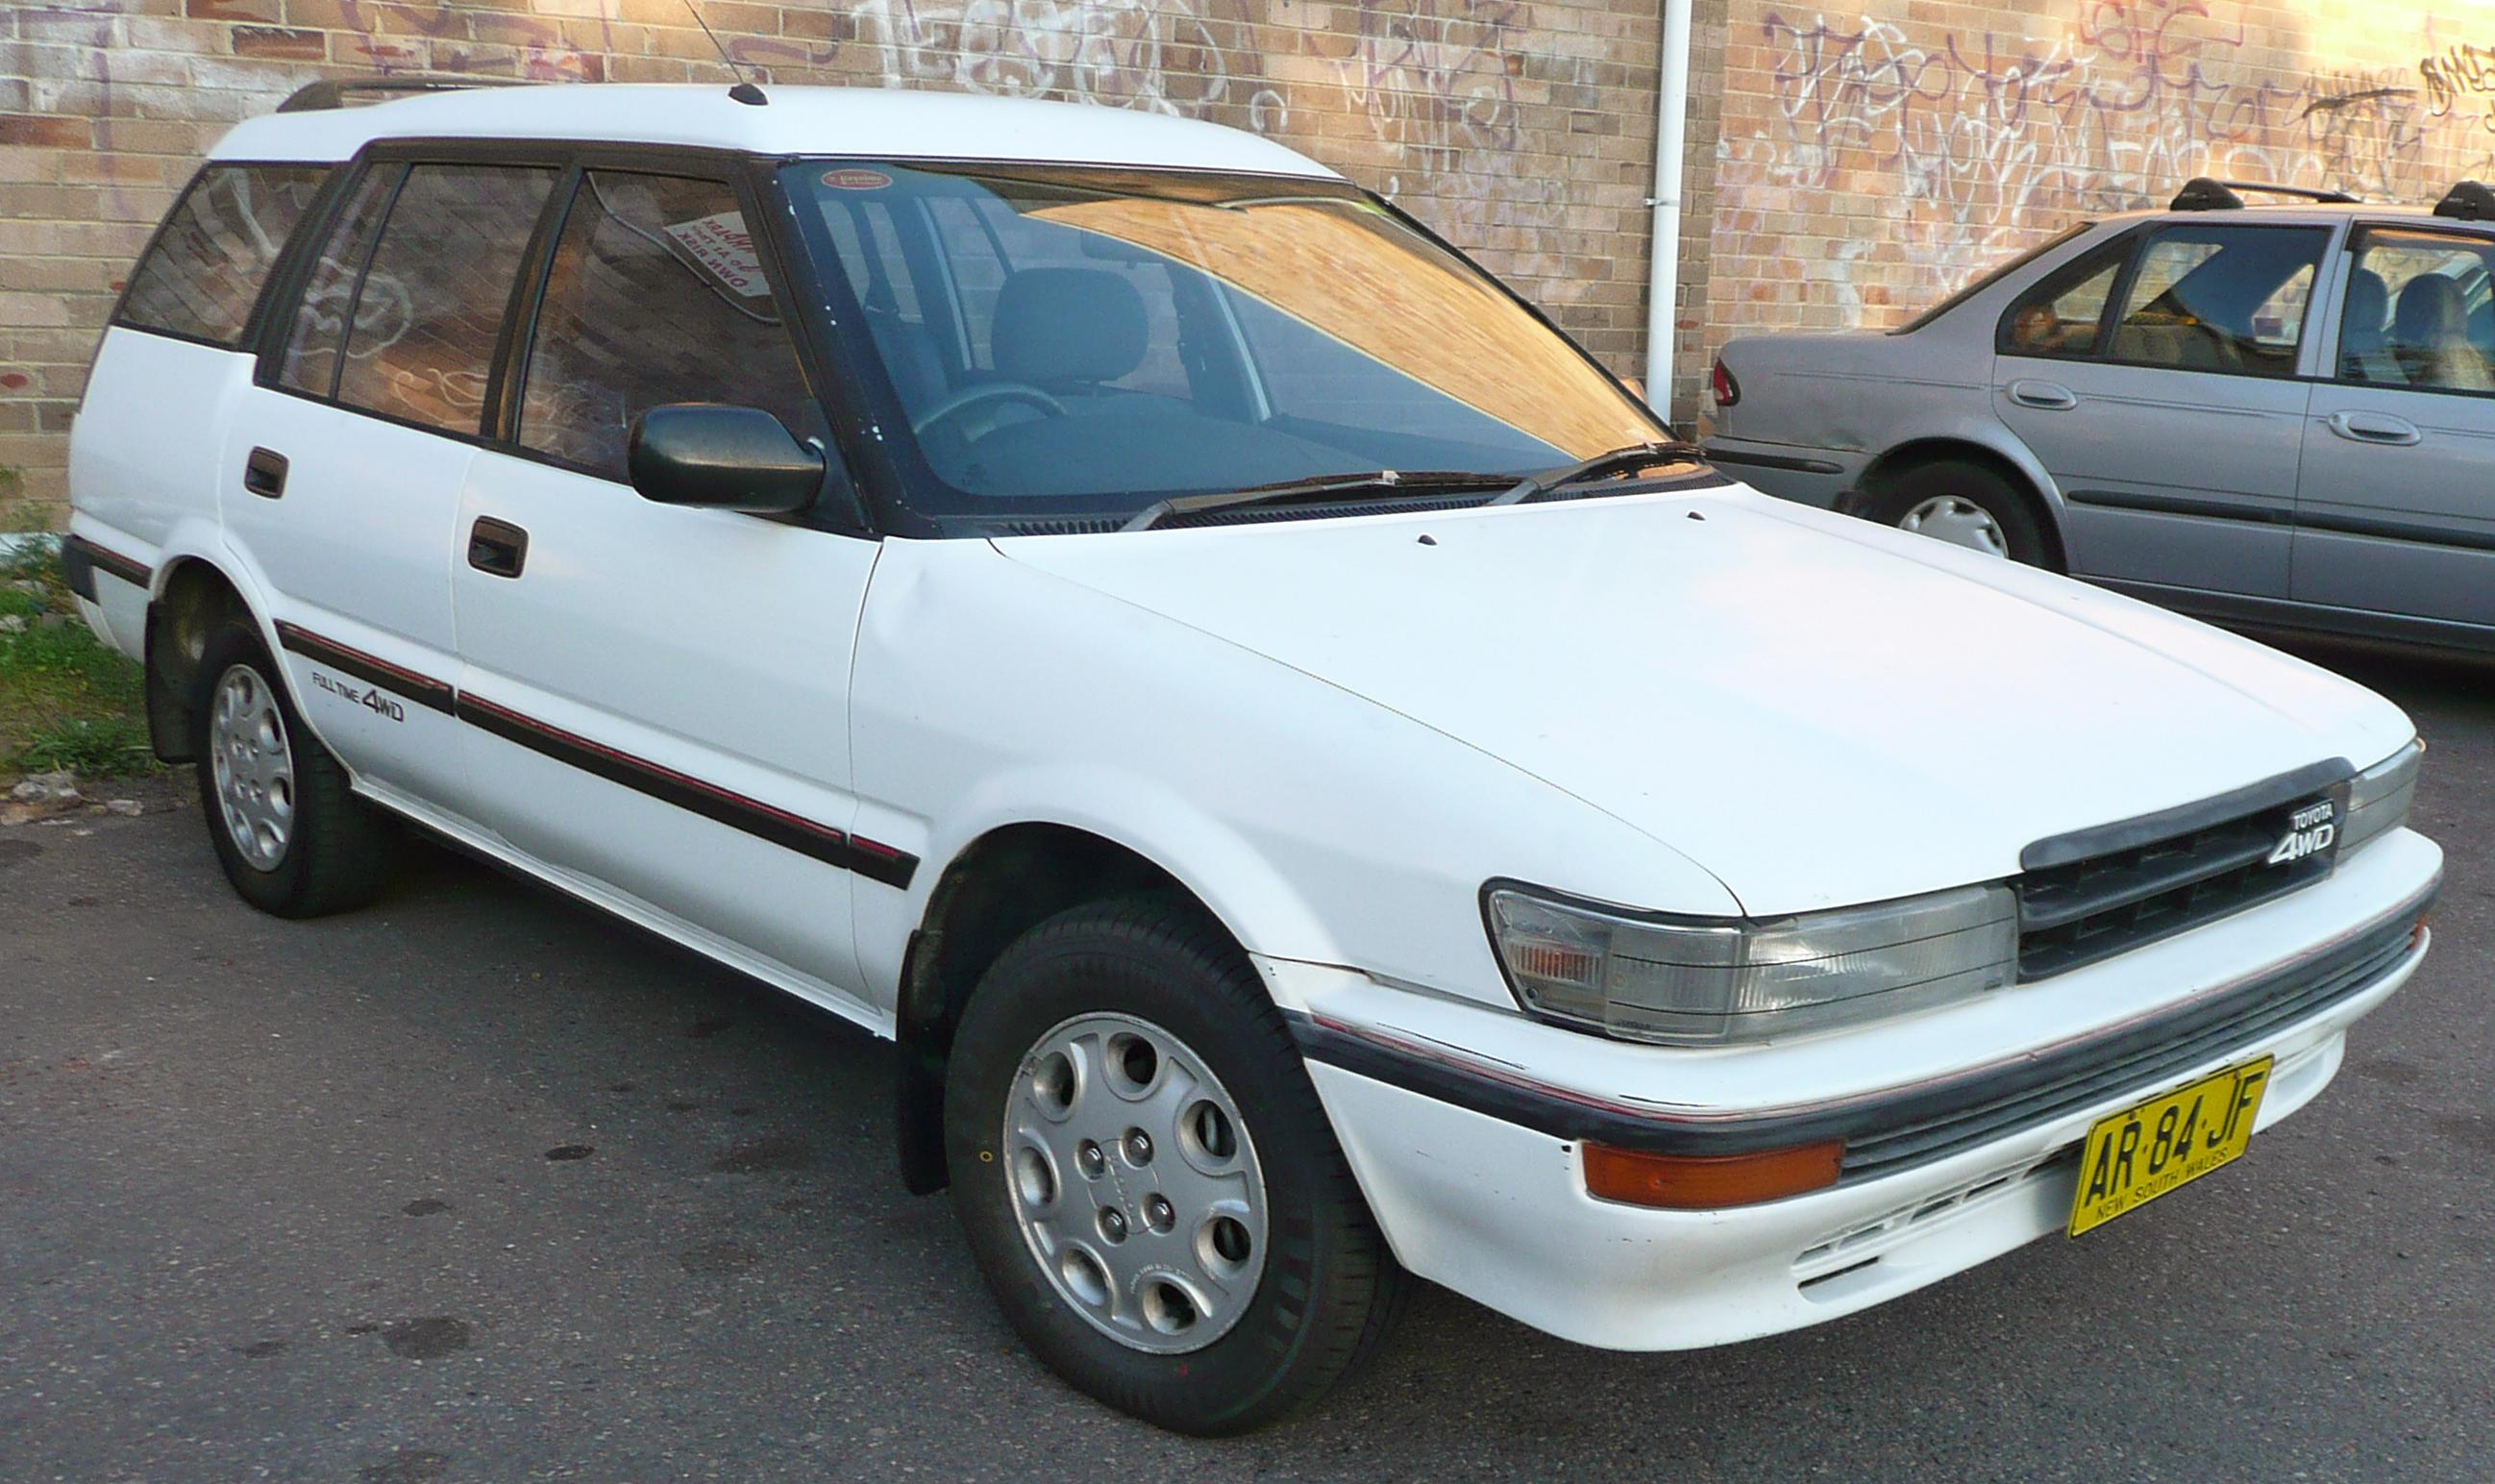 Toyota Sprinter Carib I 1982 - 1988 Station wagon 5 door #4